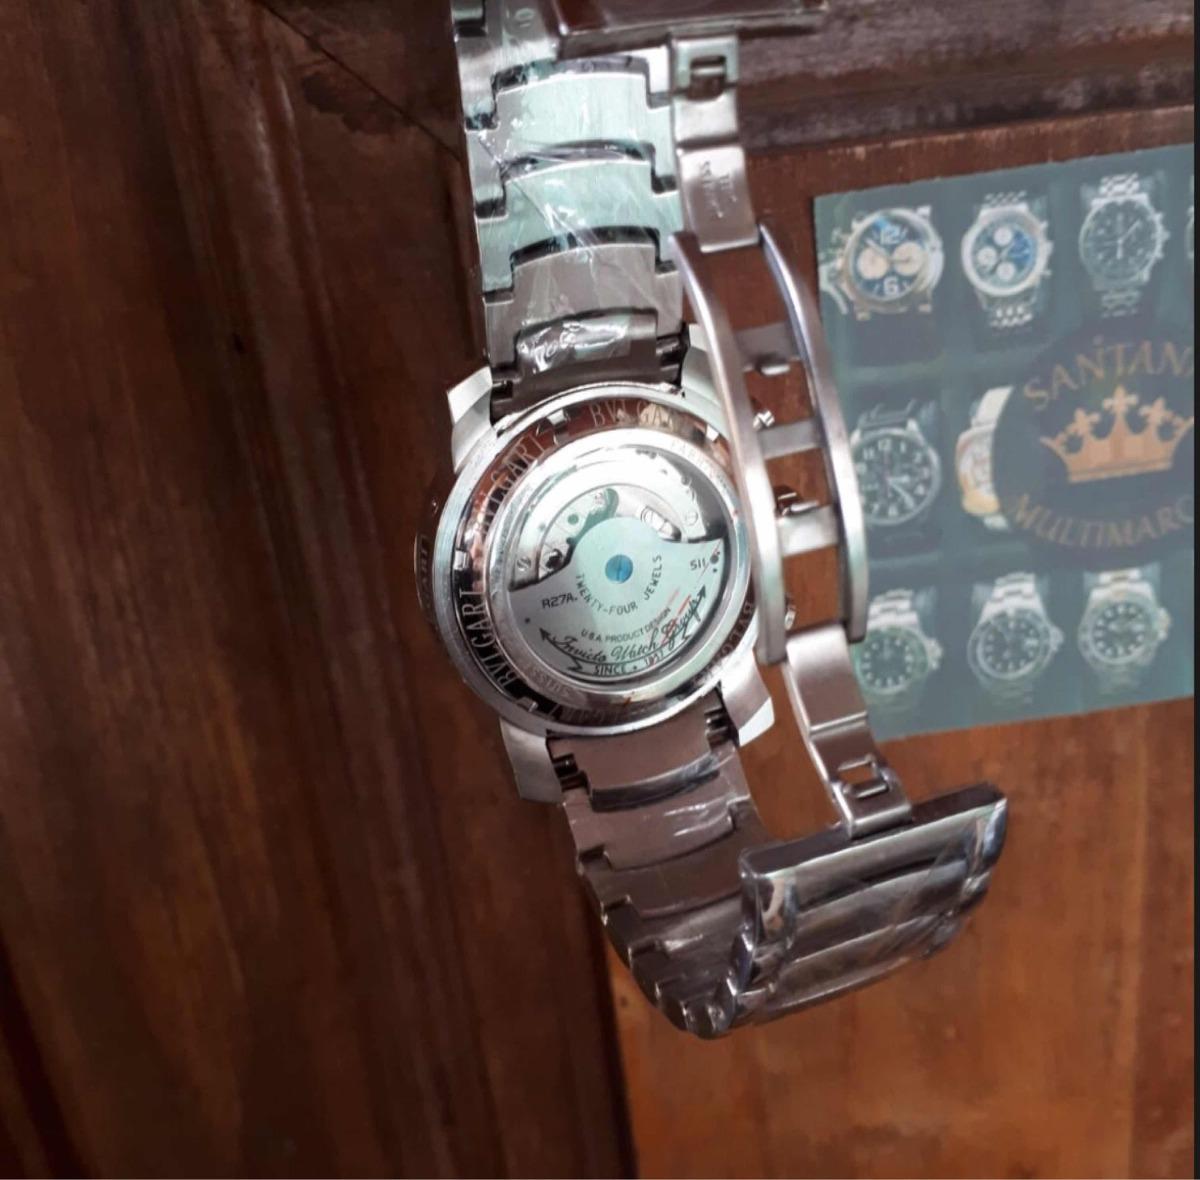 e260de56313 relógio bvlgari iron man venon skeleton dourado prata preto. Carregando  zoom.